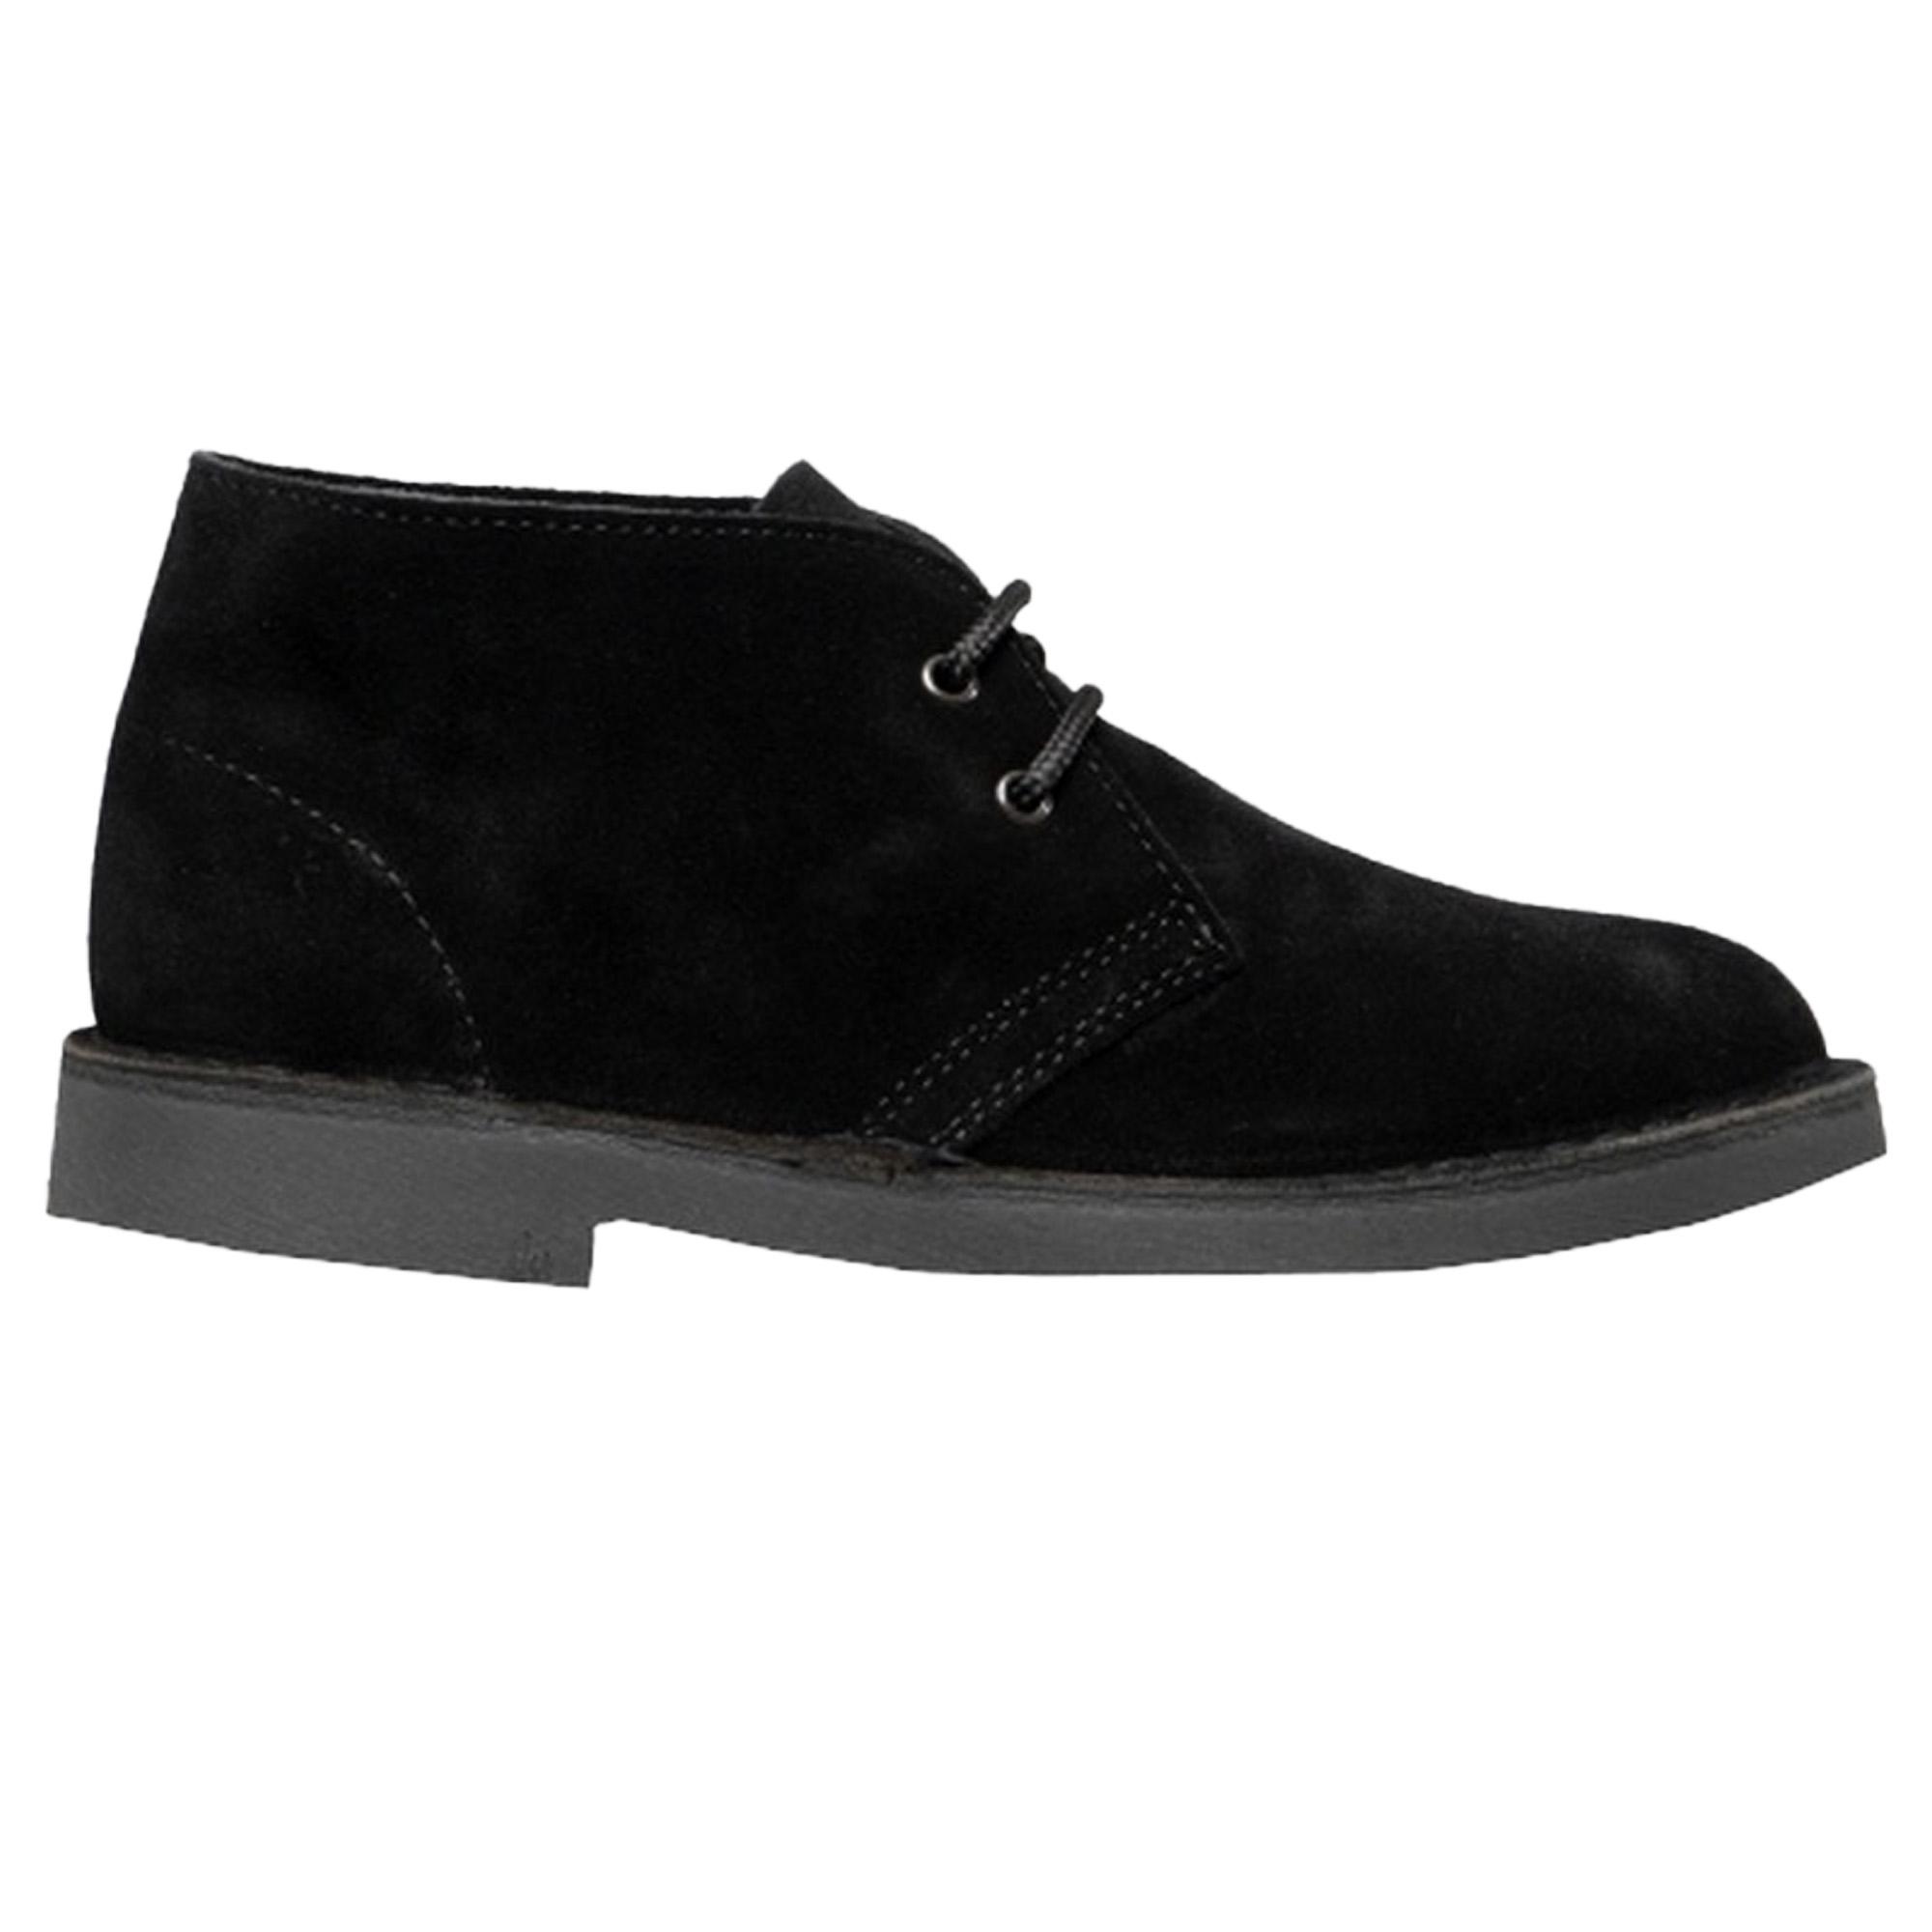 Roamers Adults Unisex Real Suede Unlined Desert Boots (11 UK) (Dark Brown)